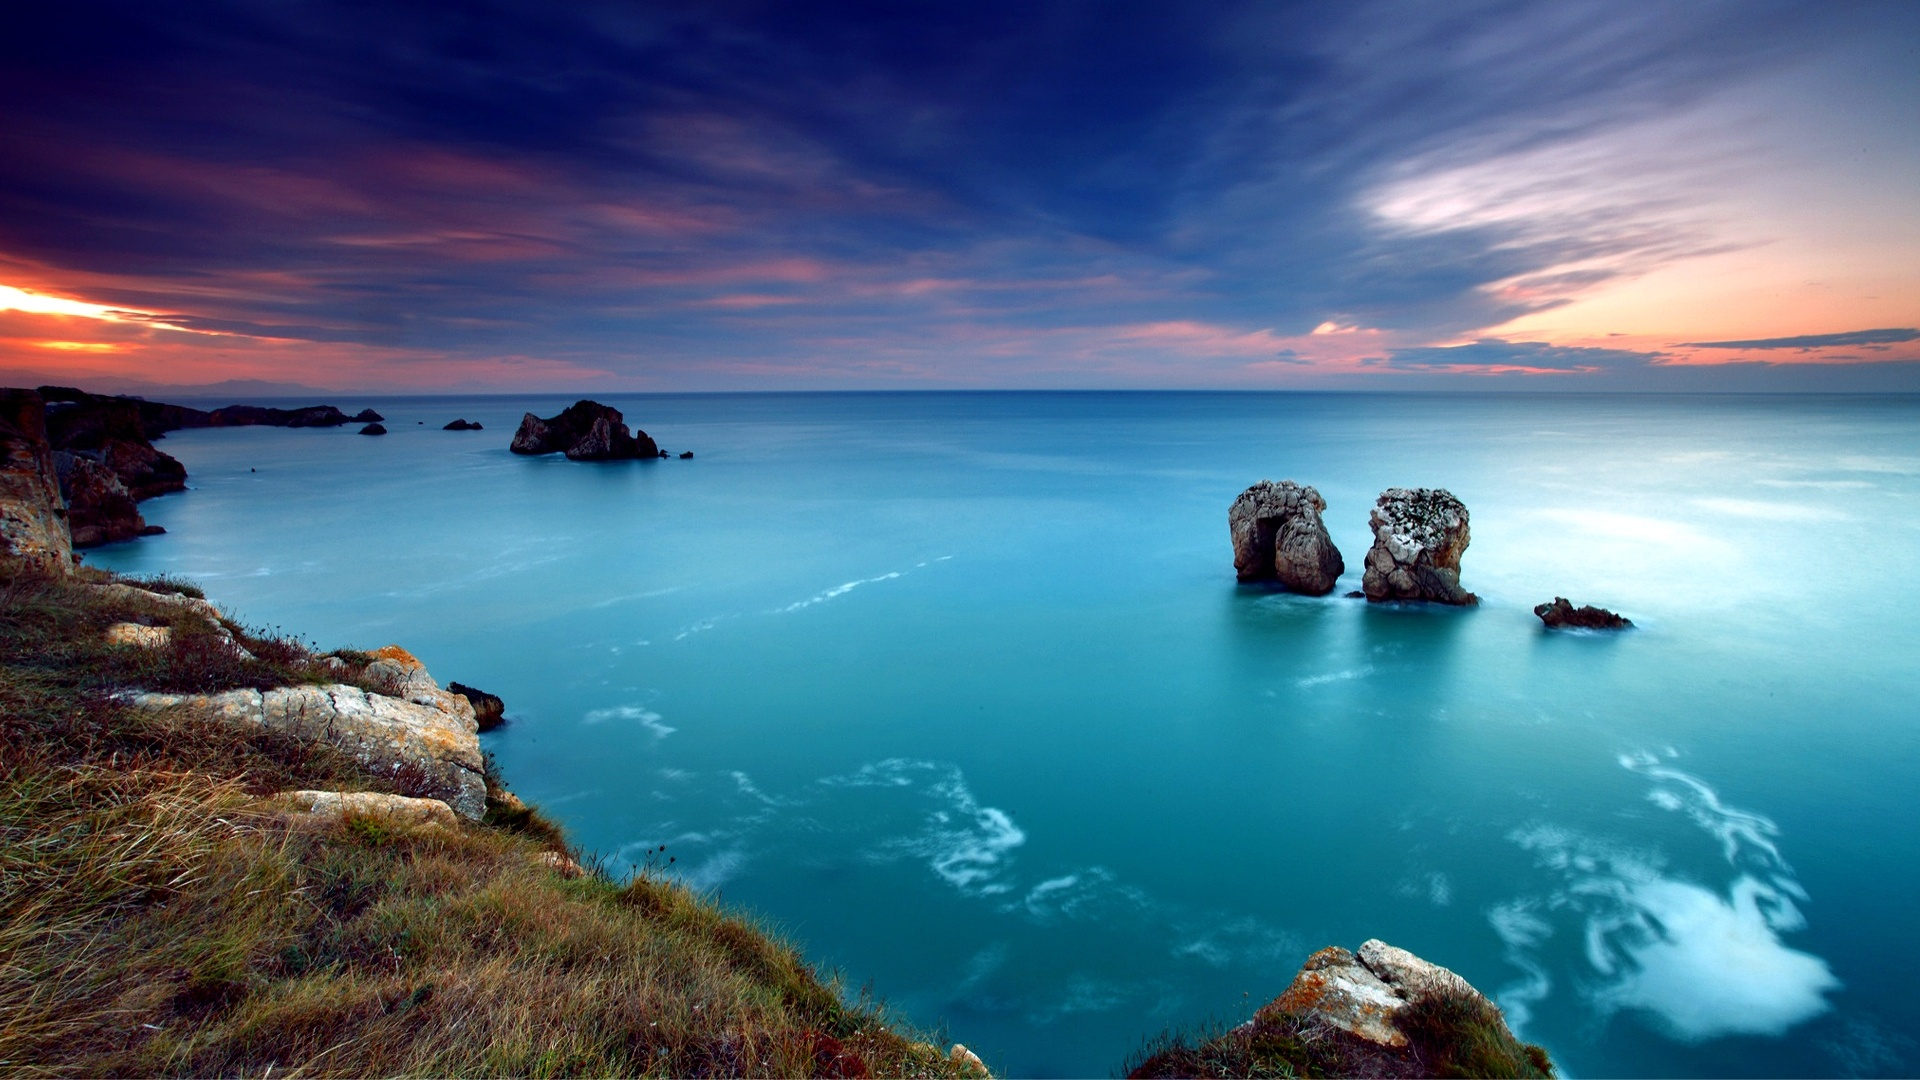 seascape-wallpaper-7.jpg